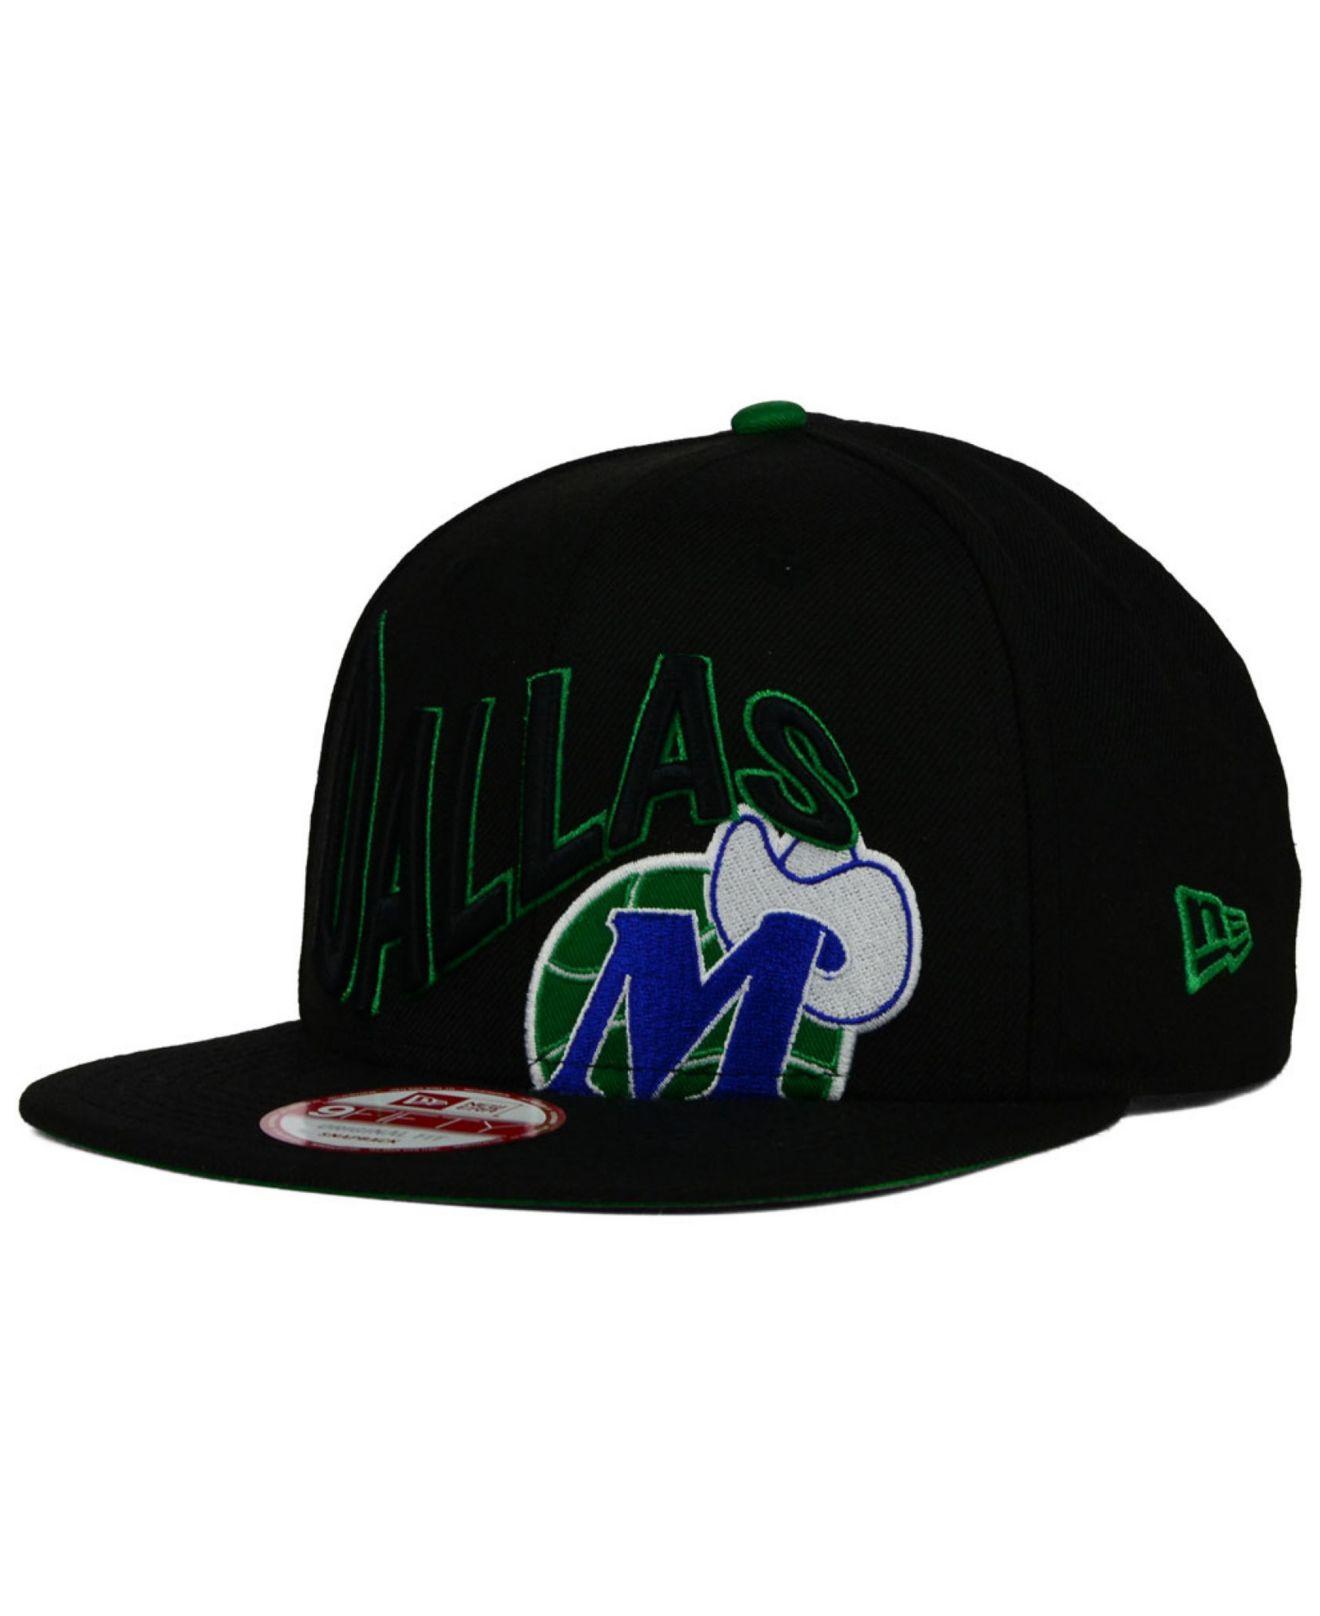 new styles 2316b b4c78 ... free shipping lyst ktz dallas mavericks neon wave 9fifty snapback cap  in black 8b530 04786